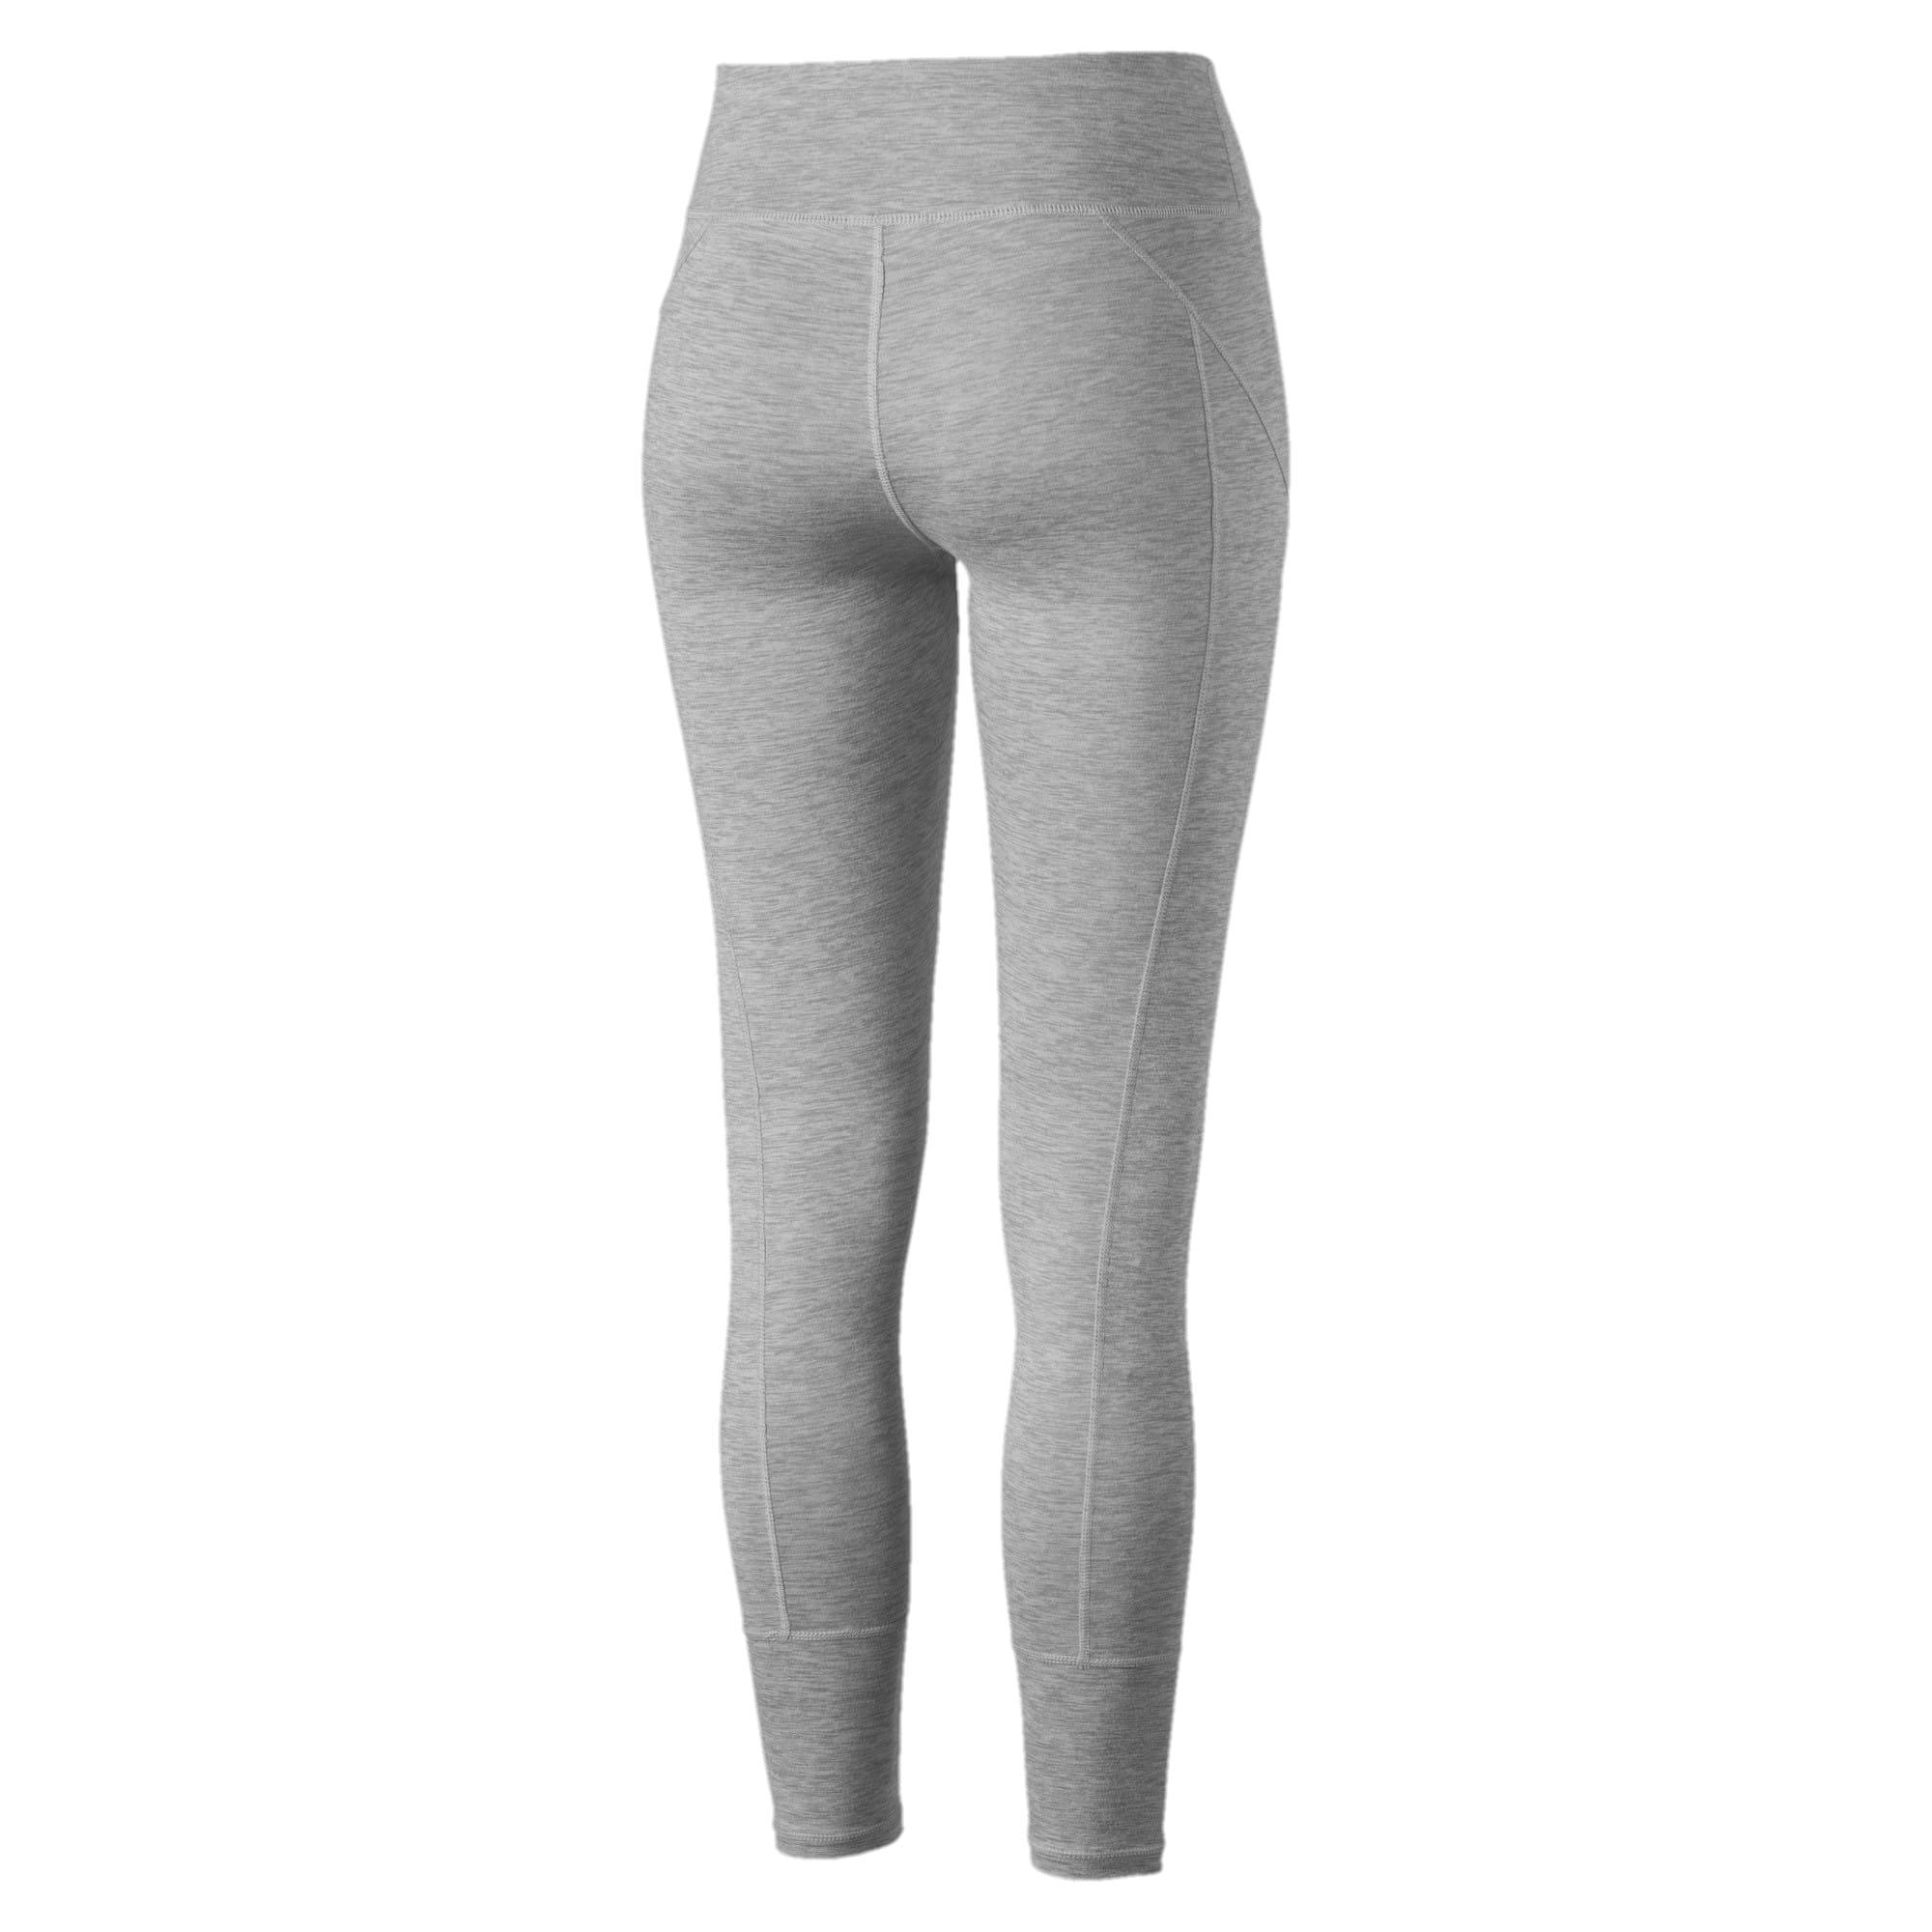 Thumbnail 3 of Yogini Logo Women's 7/8 Leggings, Light Gray Heather, medium